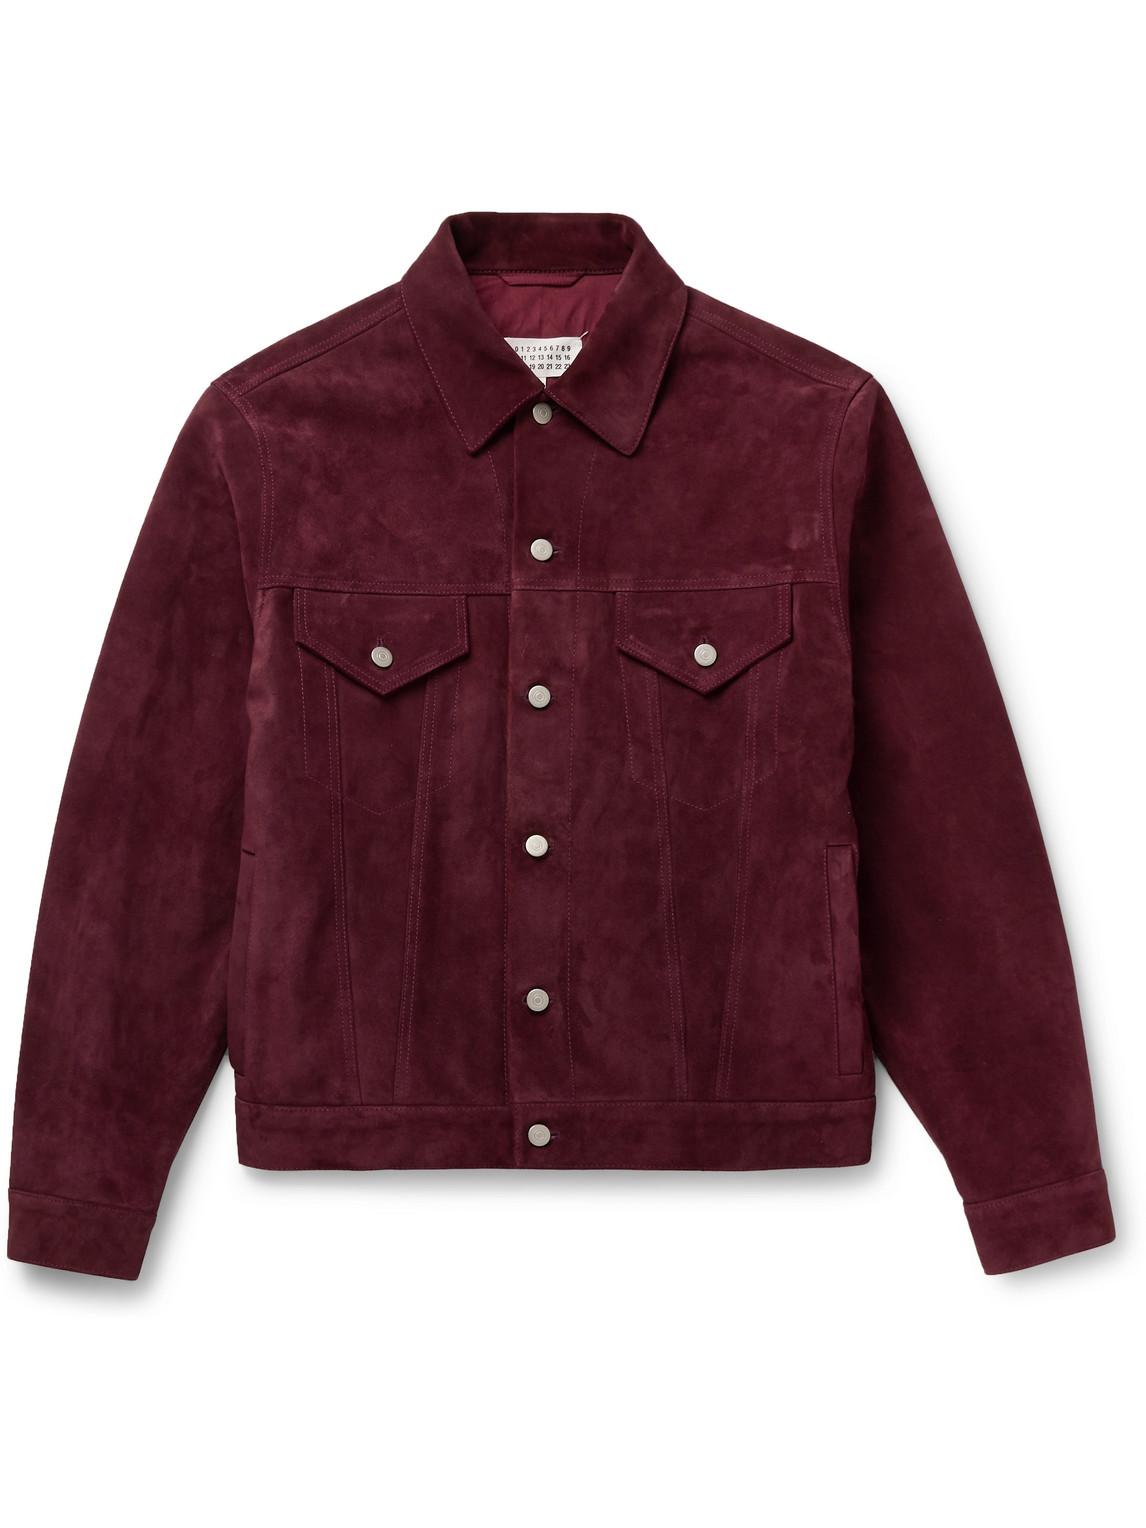 maison margiela - suede blouson jacket - men - burgundy - it 52